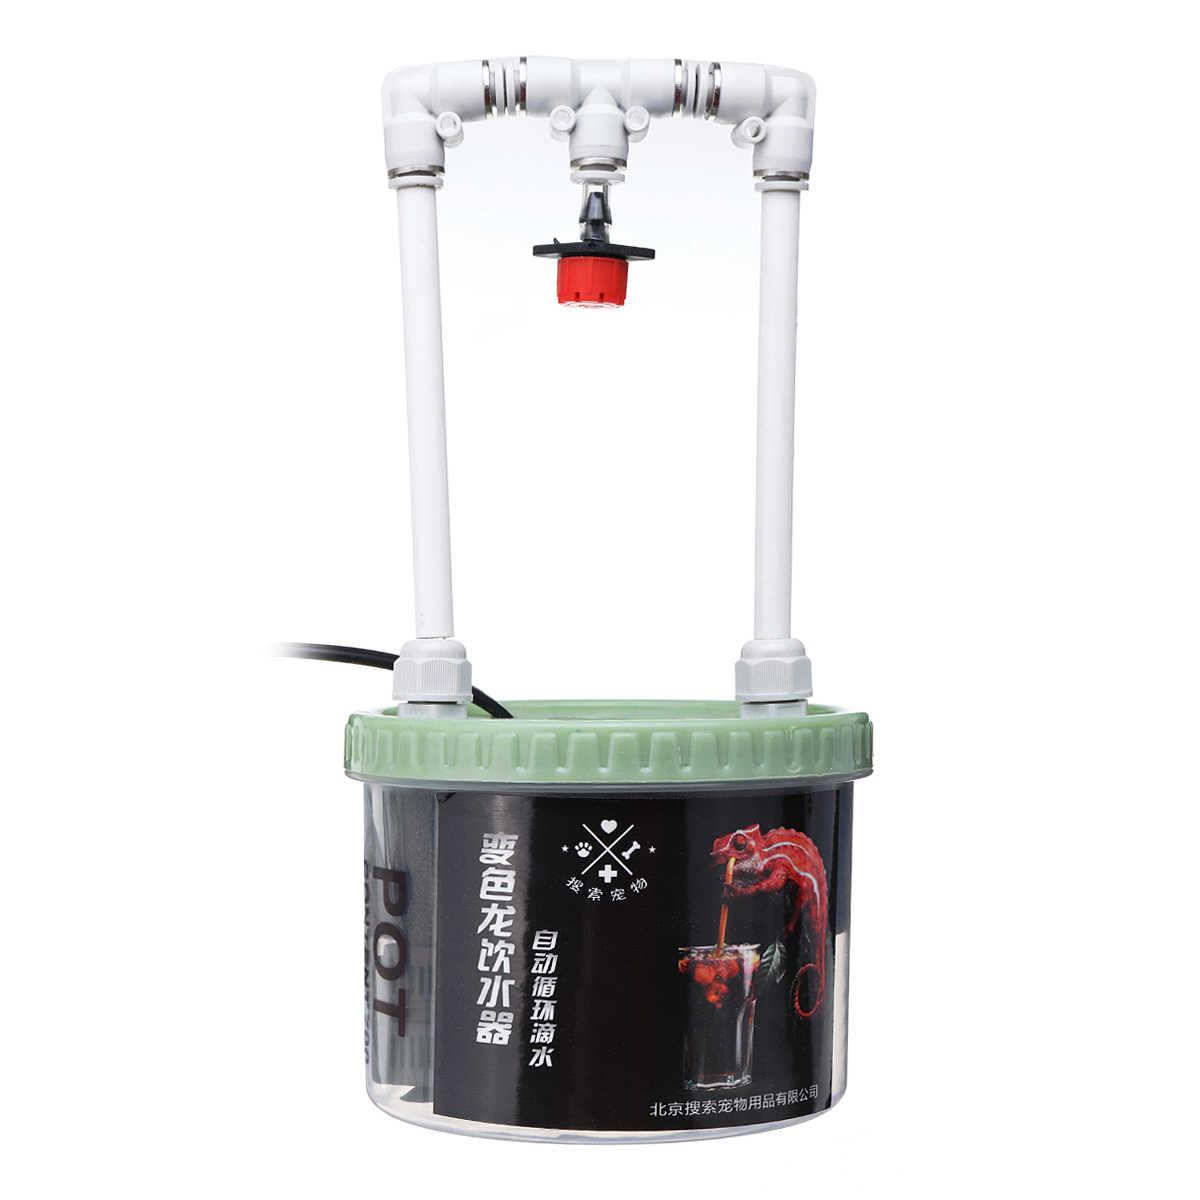 2 W 500/700 Ml Reptil Air Minum Dripper Kadal Ular Laba-laba Dispenser Air Terarium Habitat Perlengkapan Makan 220 V